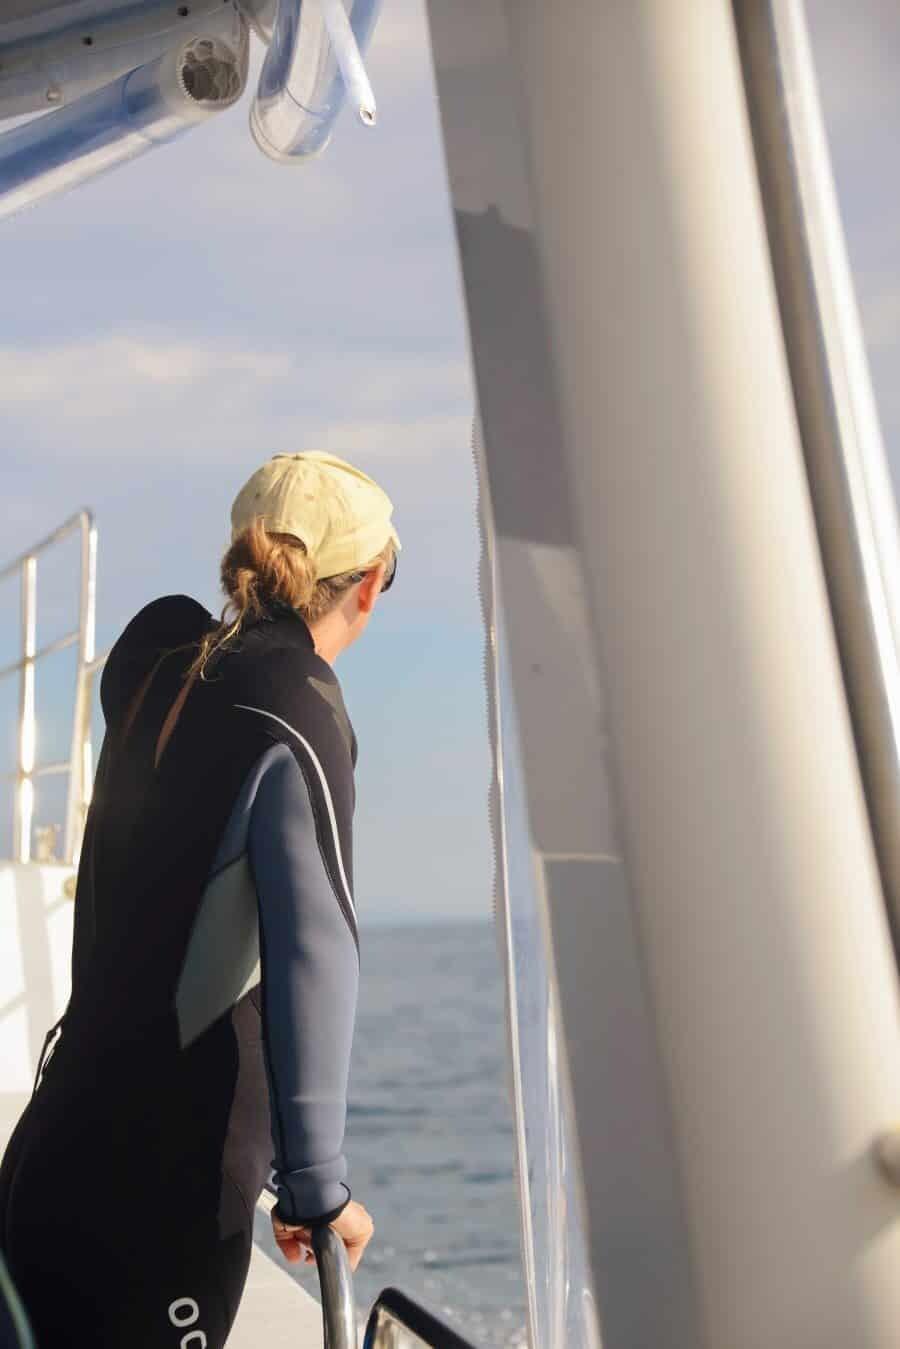 sunshine-coast-whale-swim-queensland-australia-03